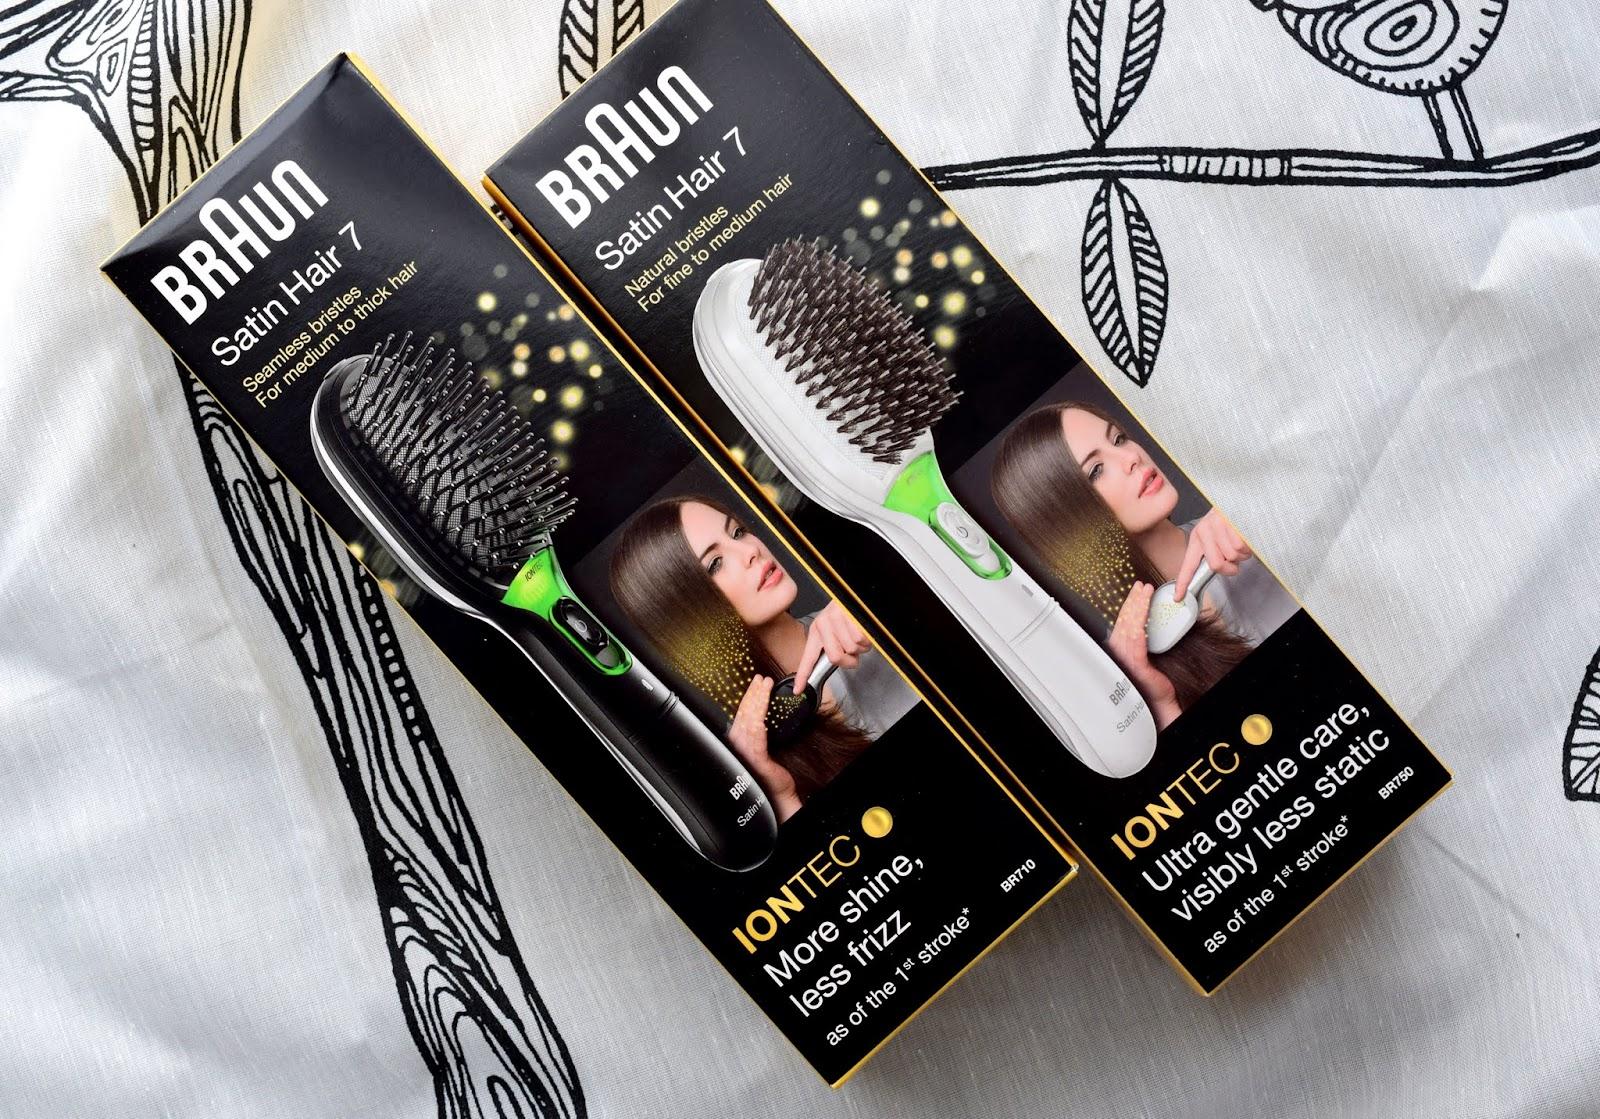 Braun Satin Hair 7 Haarbürste IONTEC Technologie